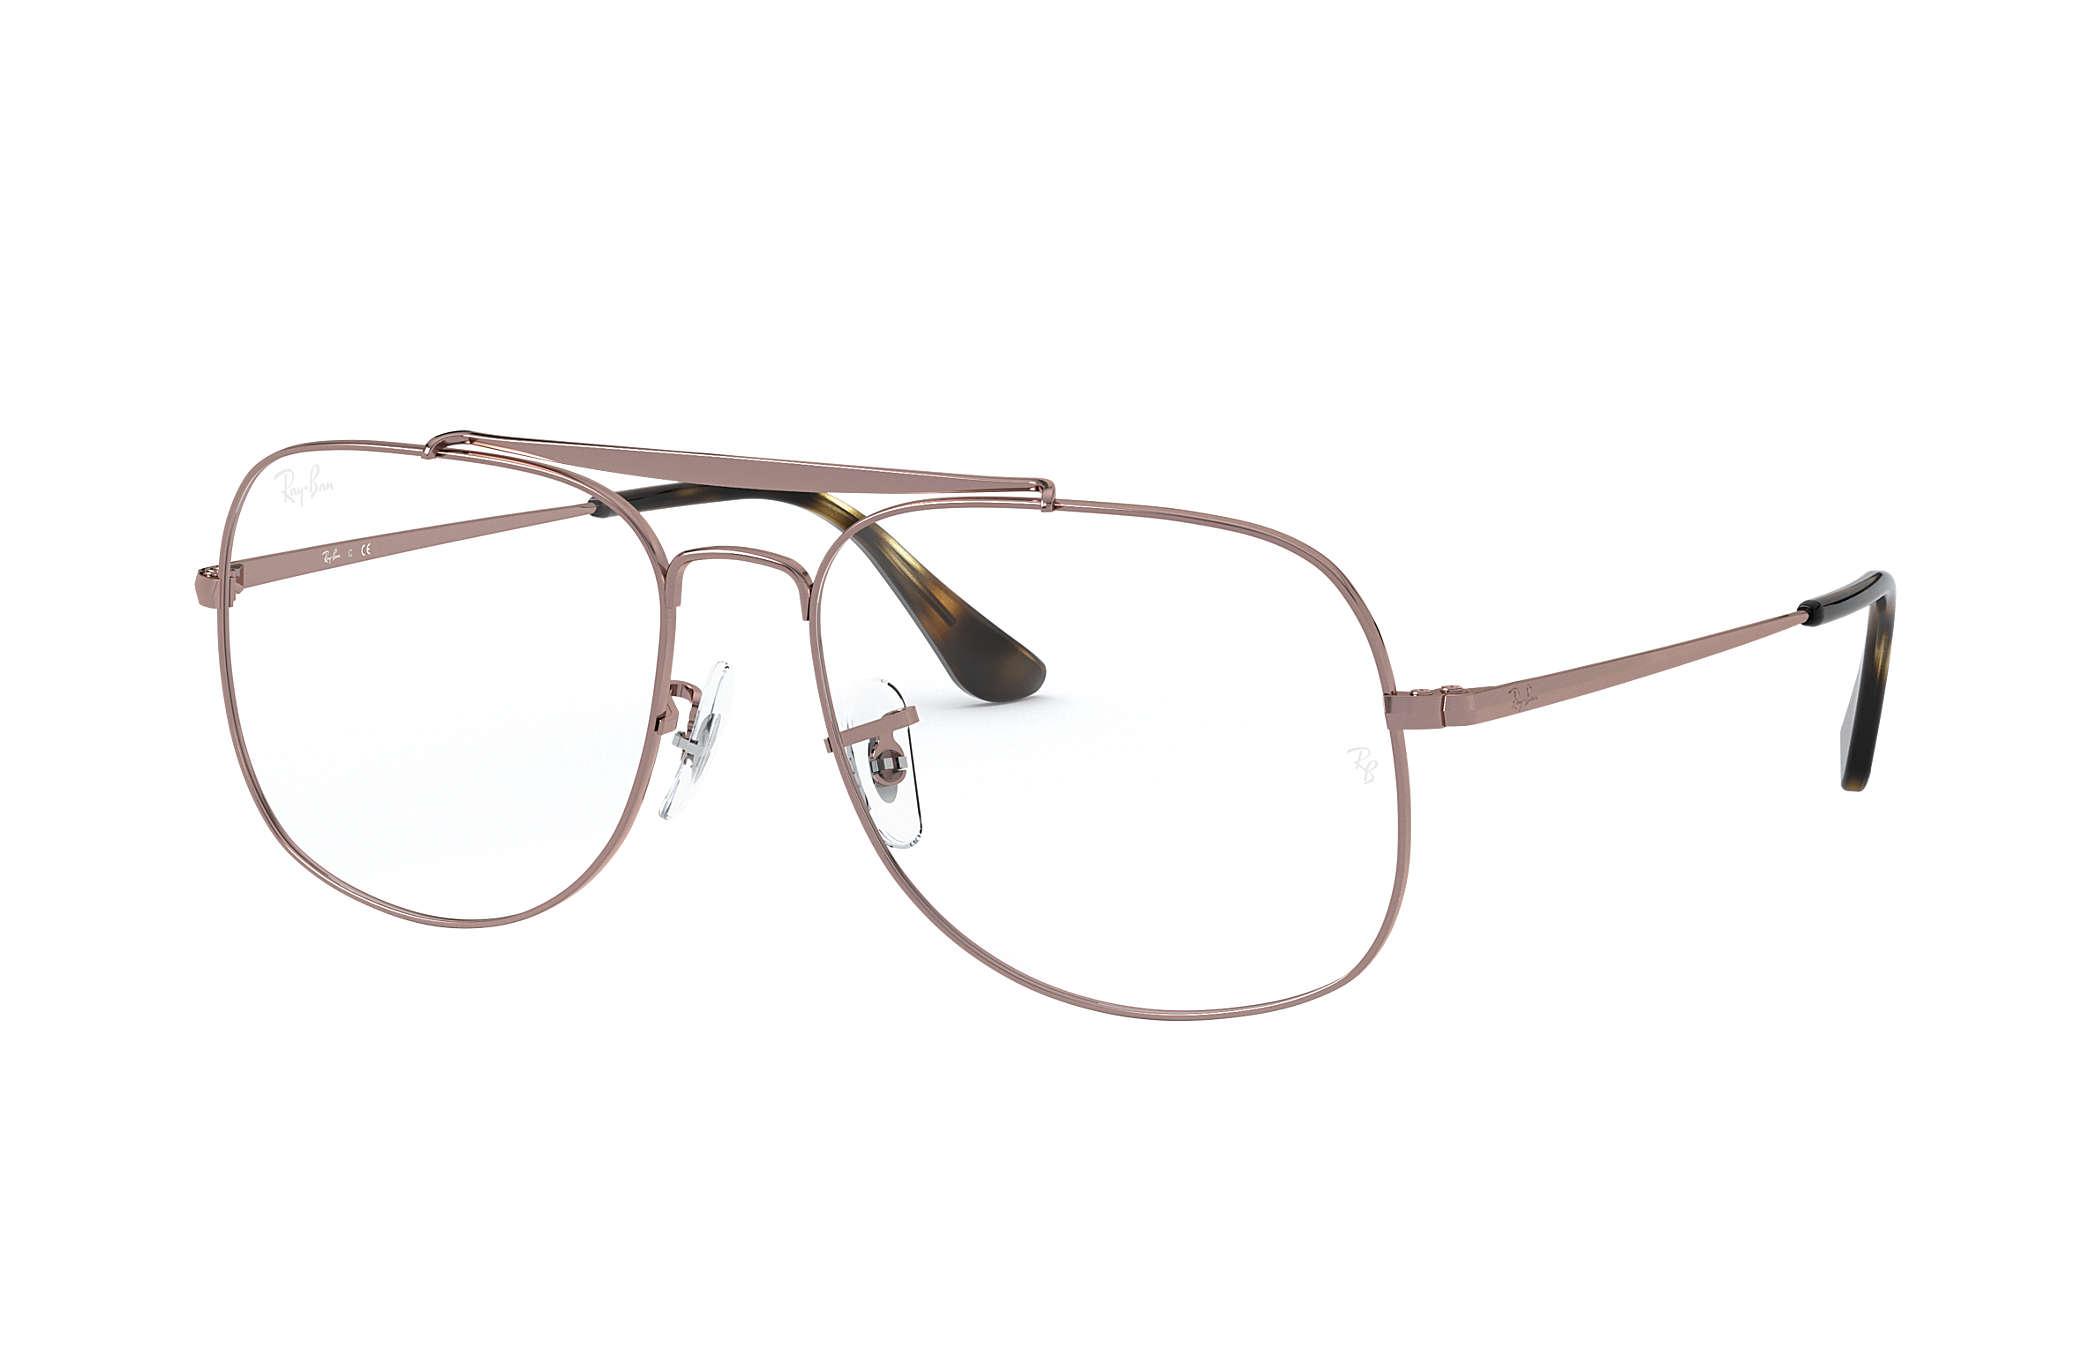 8865ce56721 Ray-Ban prescription glasses General Optics RB6389 Light Brown ...